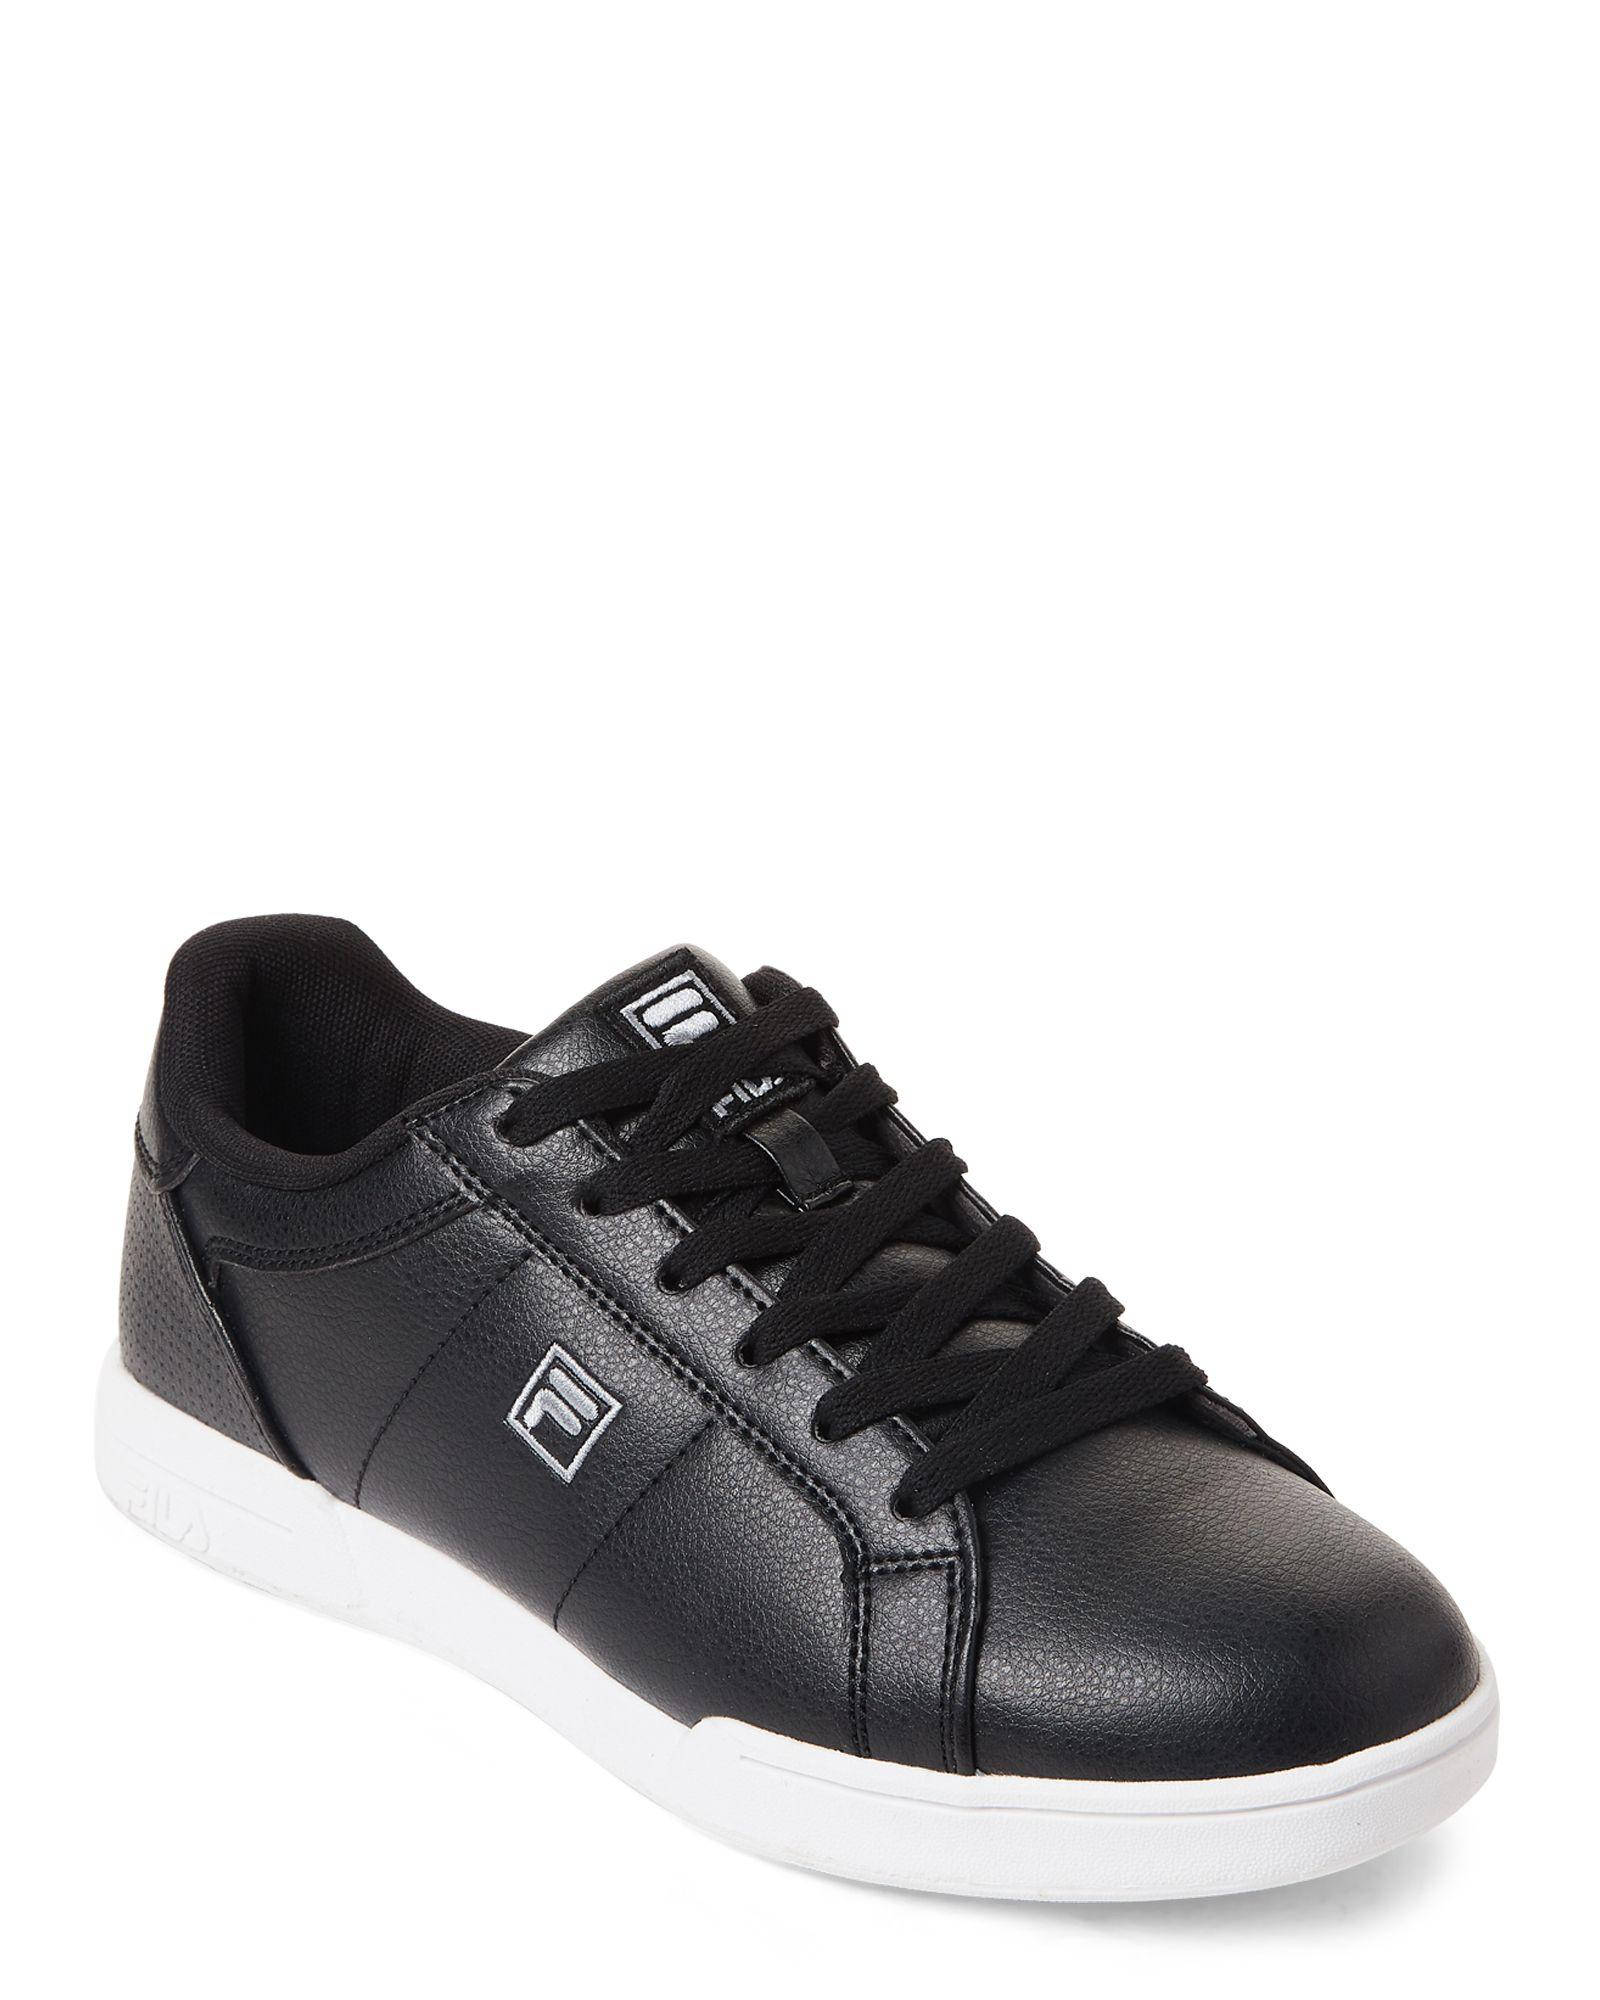 Fila Black New Campora Low Top Sneakers   Fila   Sneakers